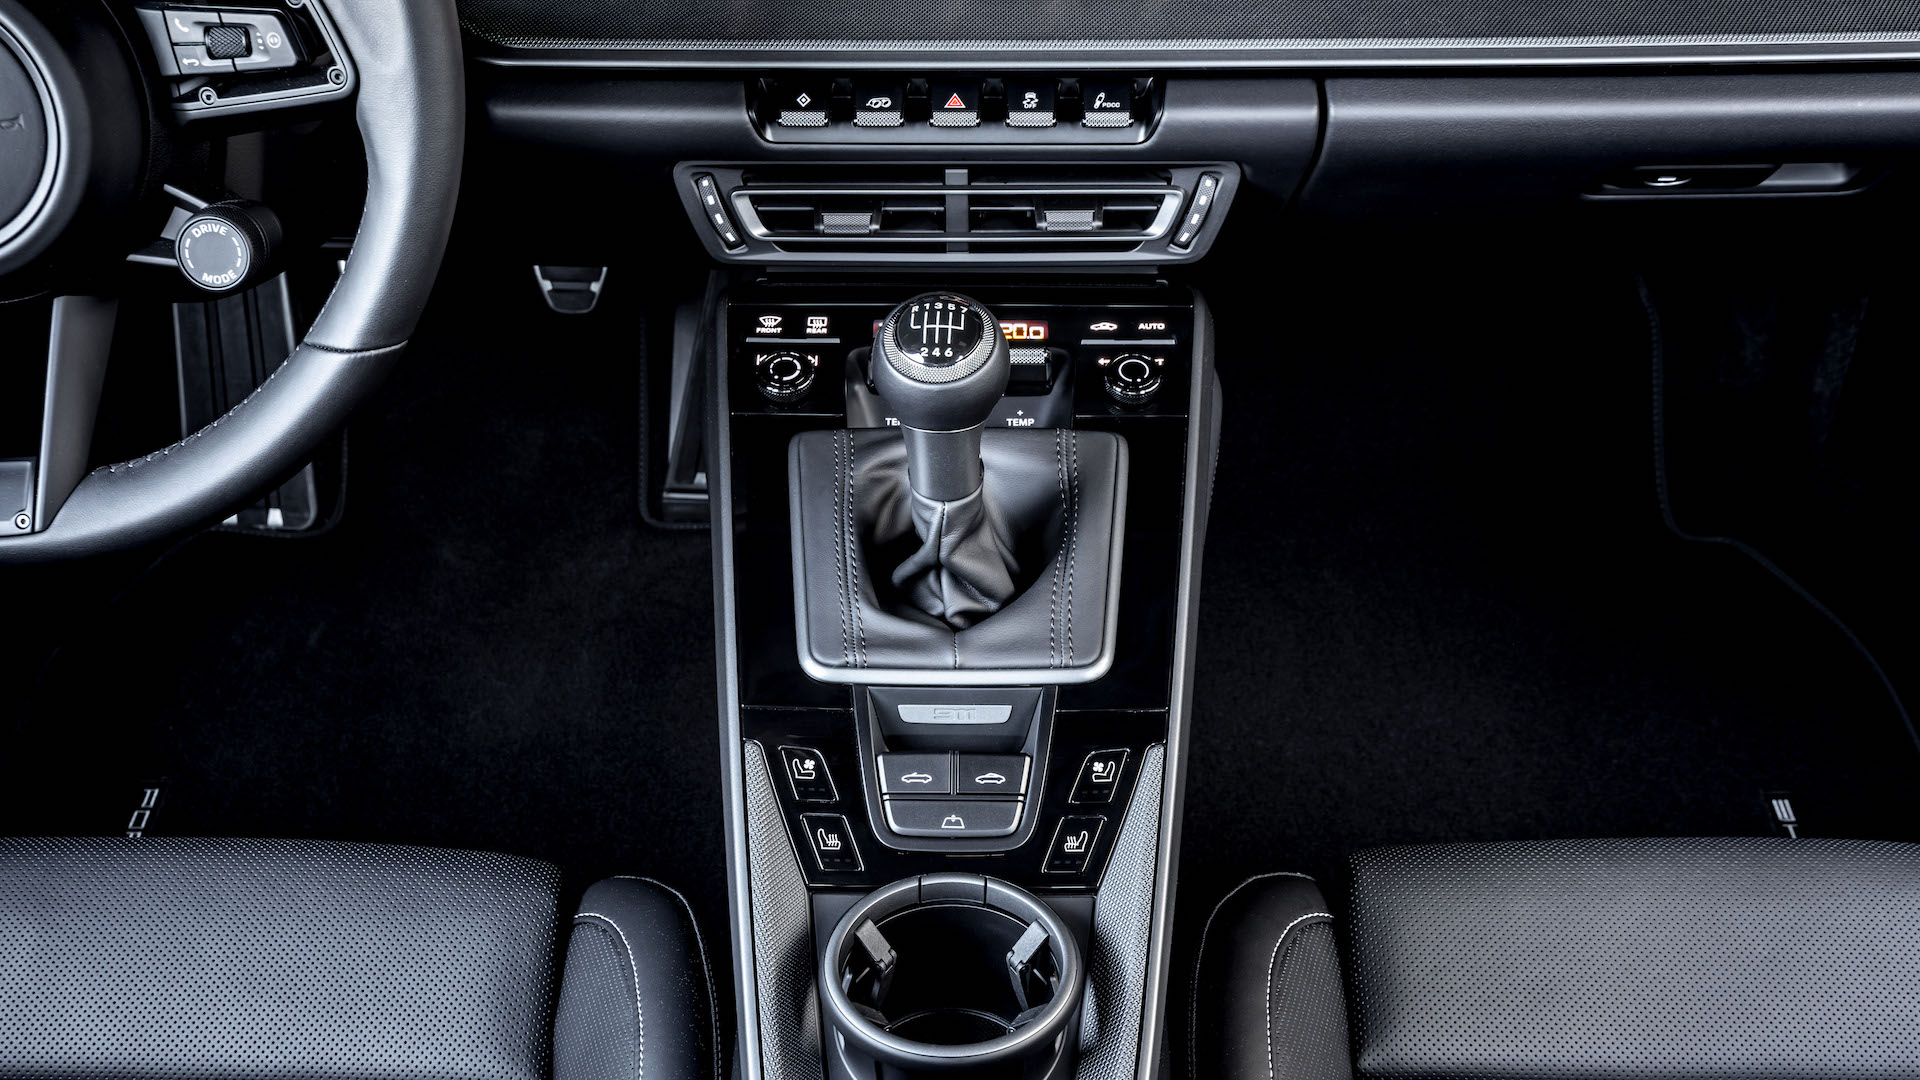 2021 Porsche 911 Update Adds 7 Speed Manual Python Green 930 Interior Option Performancedrive